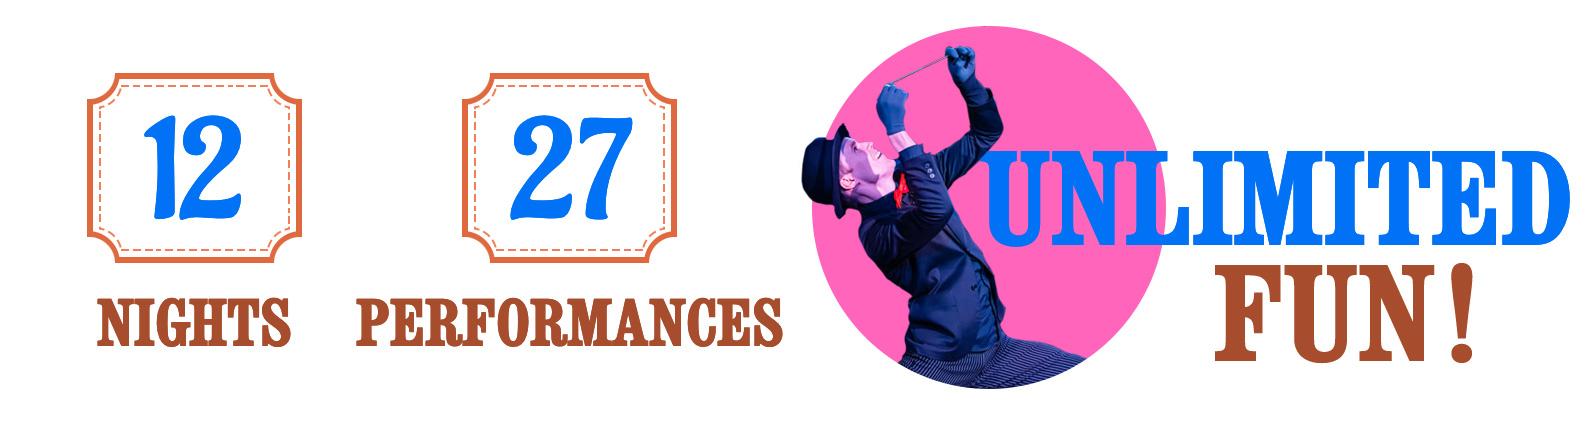 12 nights 27 performances unlimited fun